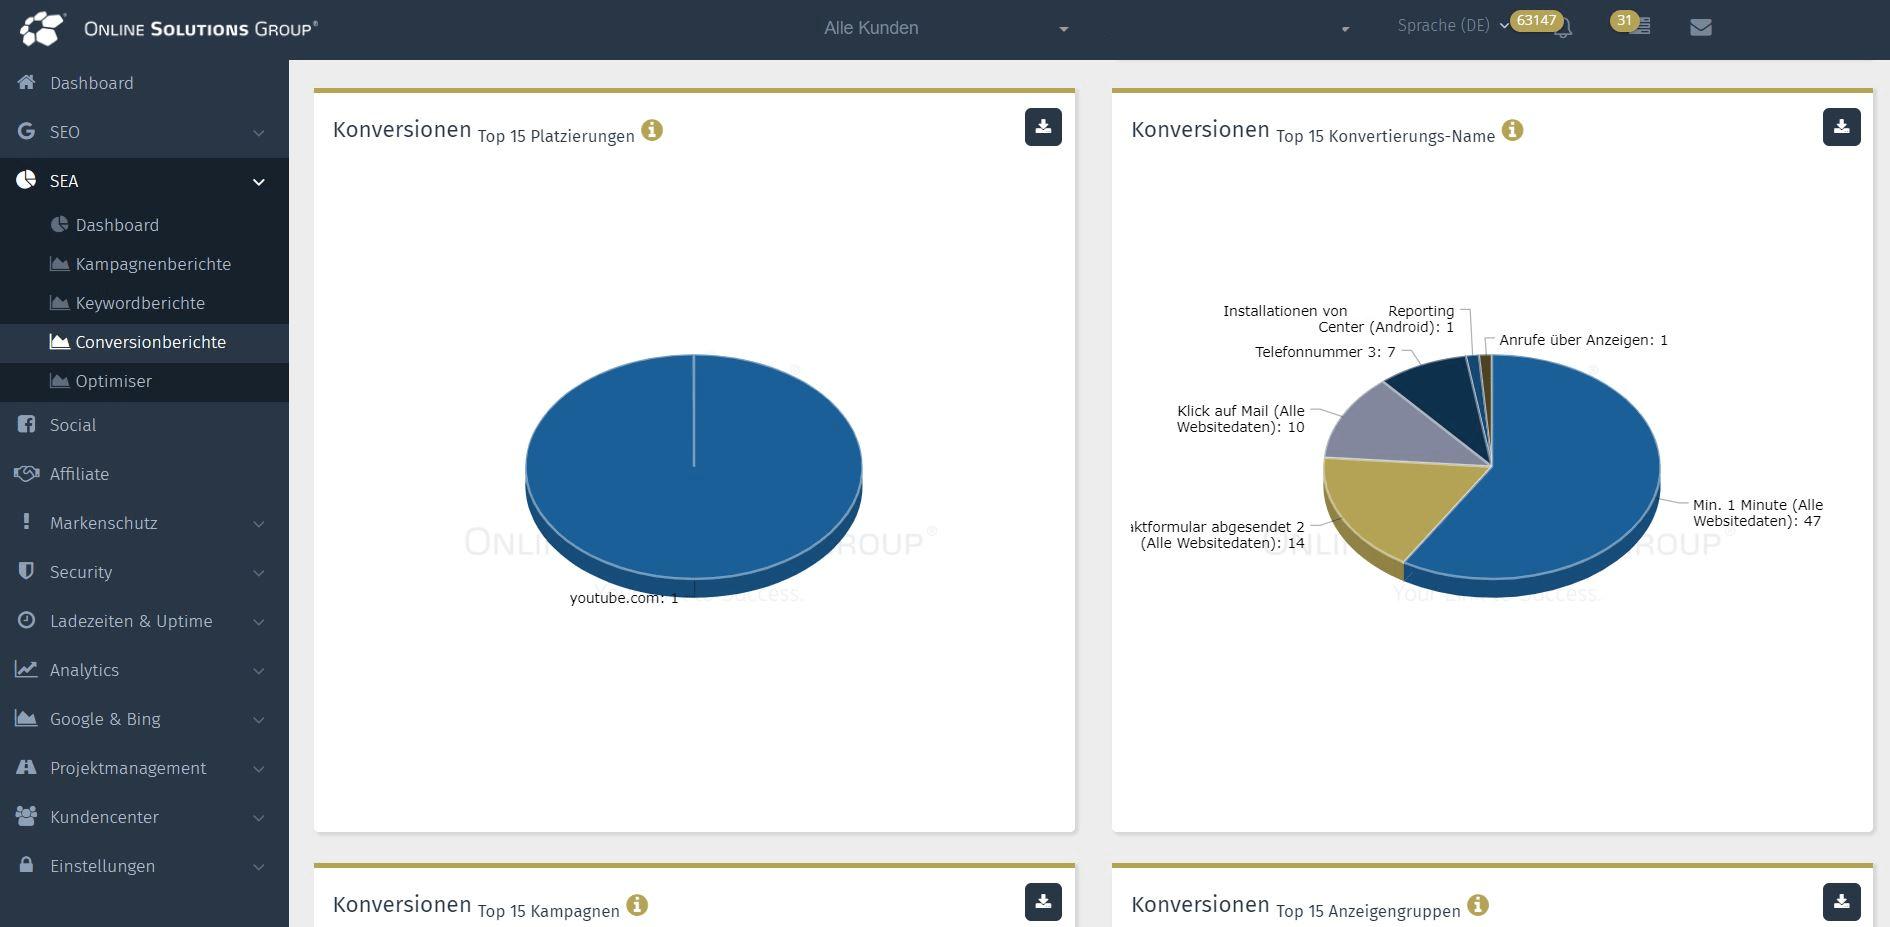 SEA Tool in der Performance Suite: Conversions nach Top-Auswertungen